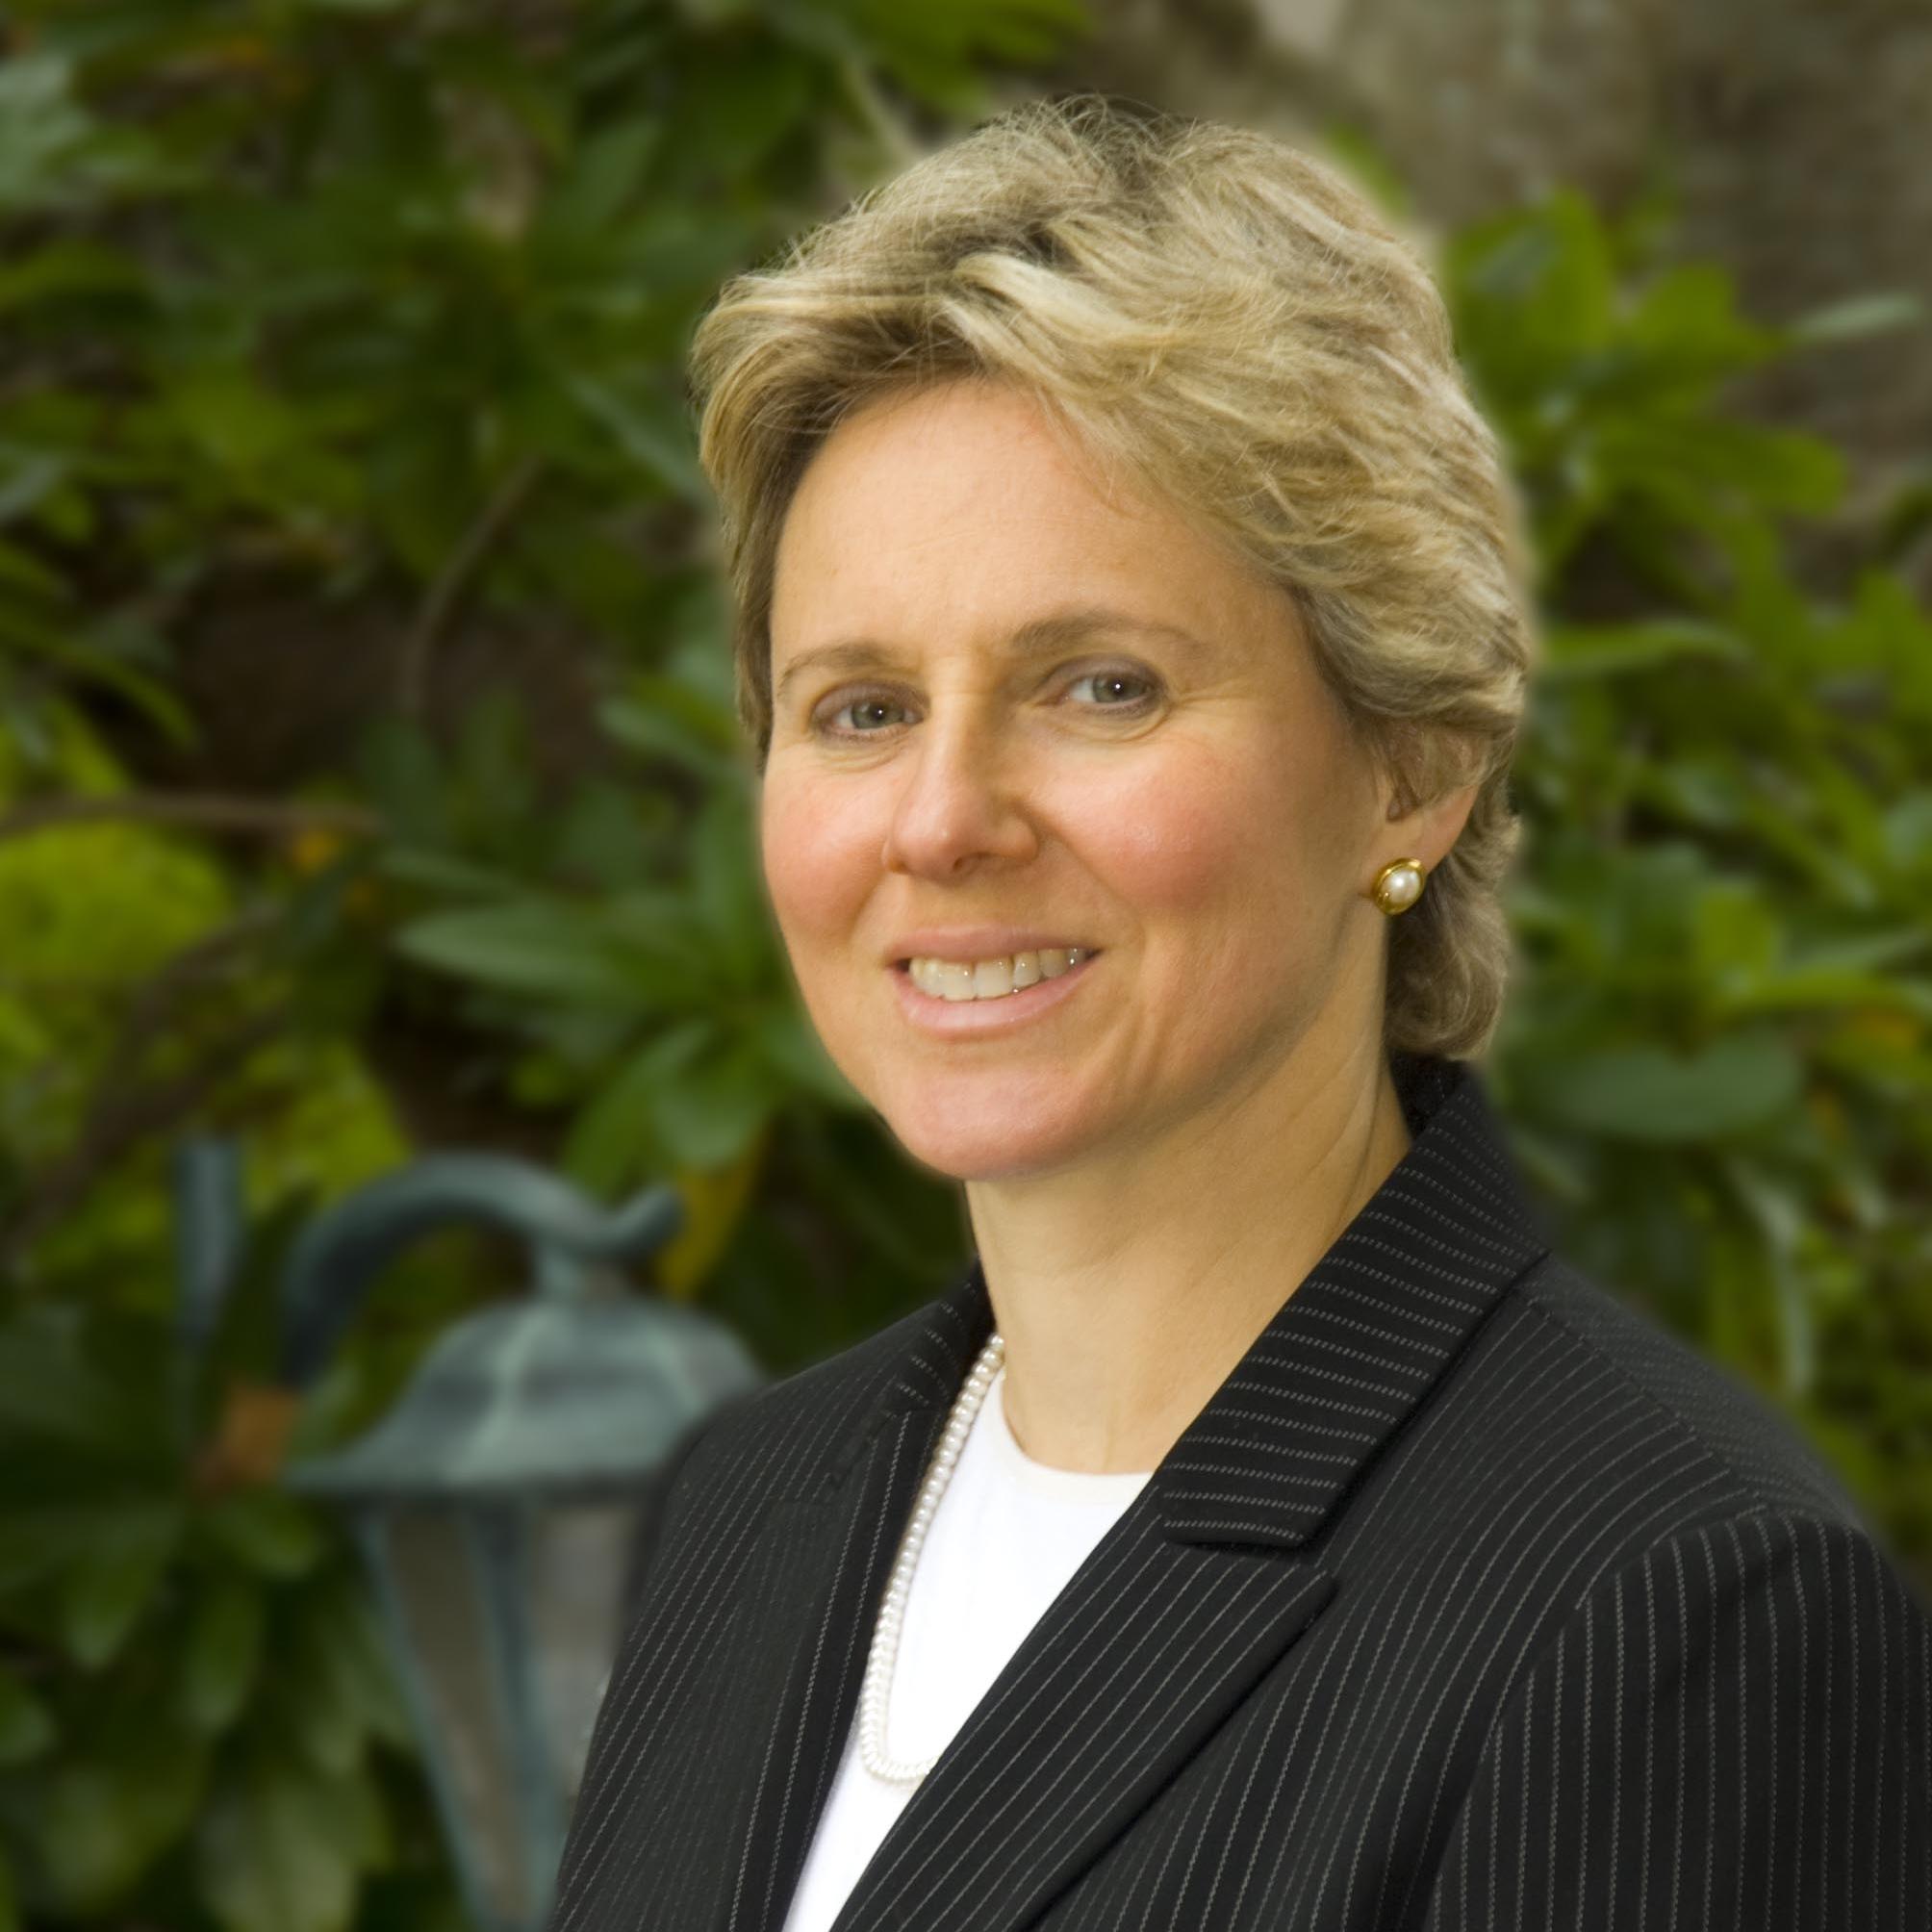 Carolyn Langer - Carolyn Langer.jpg